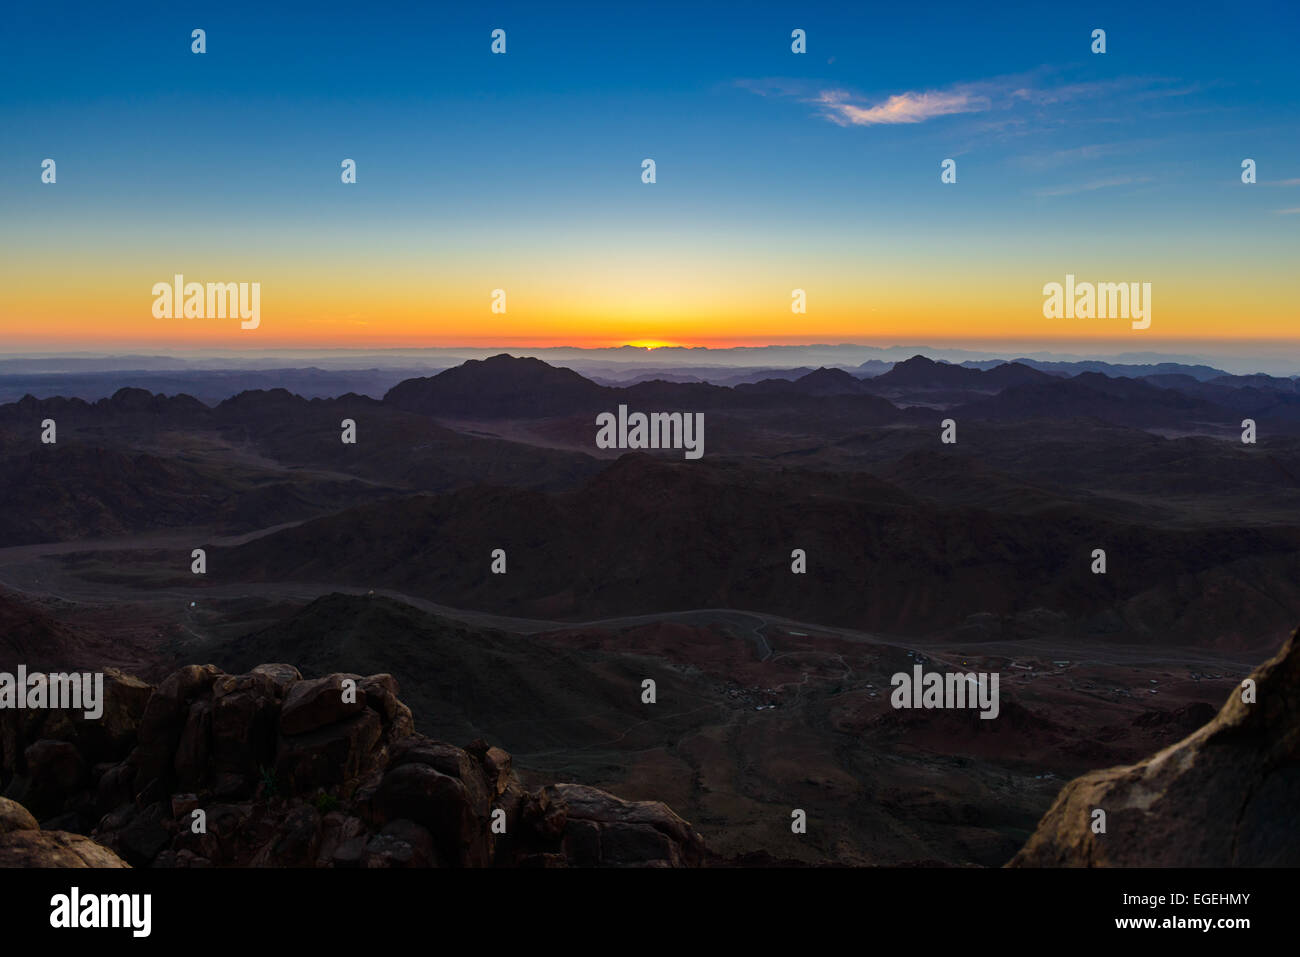 Sunrise at Mount Sinai, Egypt. Bedouins bring tourists in the night to Mount Sinai, Egypt to meet sunrise - Stock Image